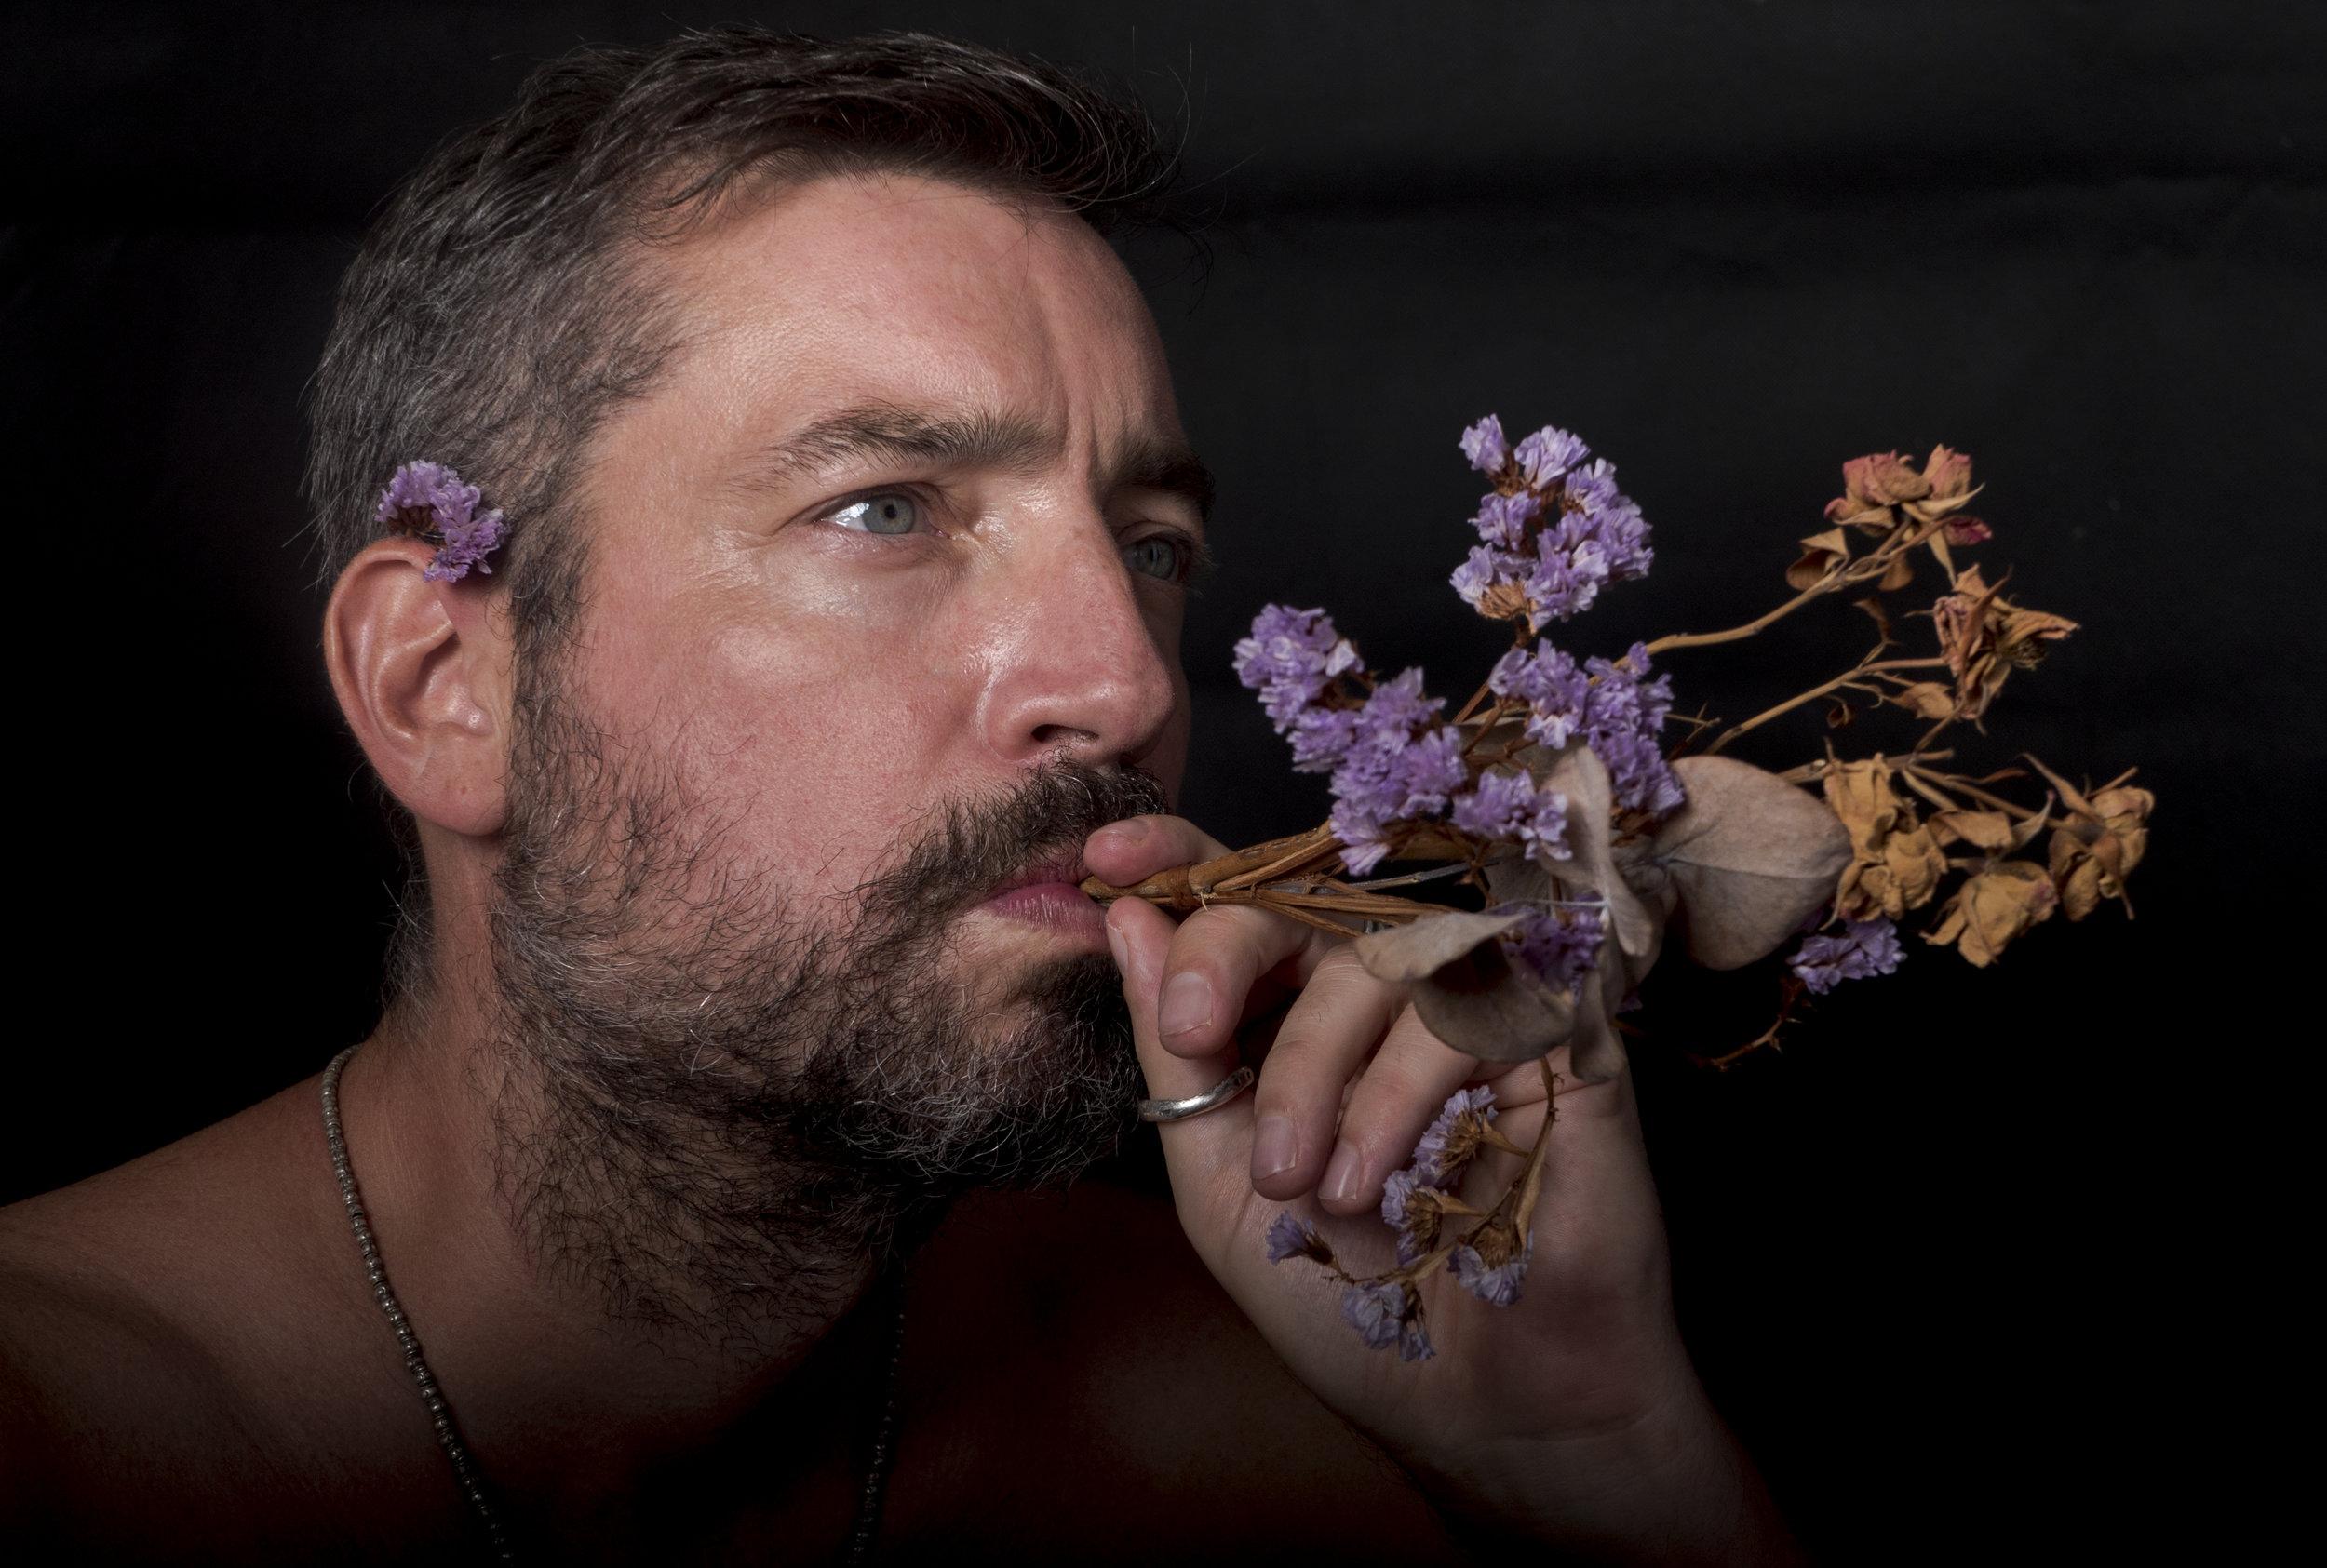 Flower Power , 2019